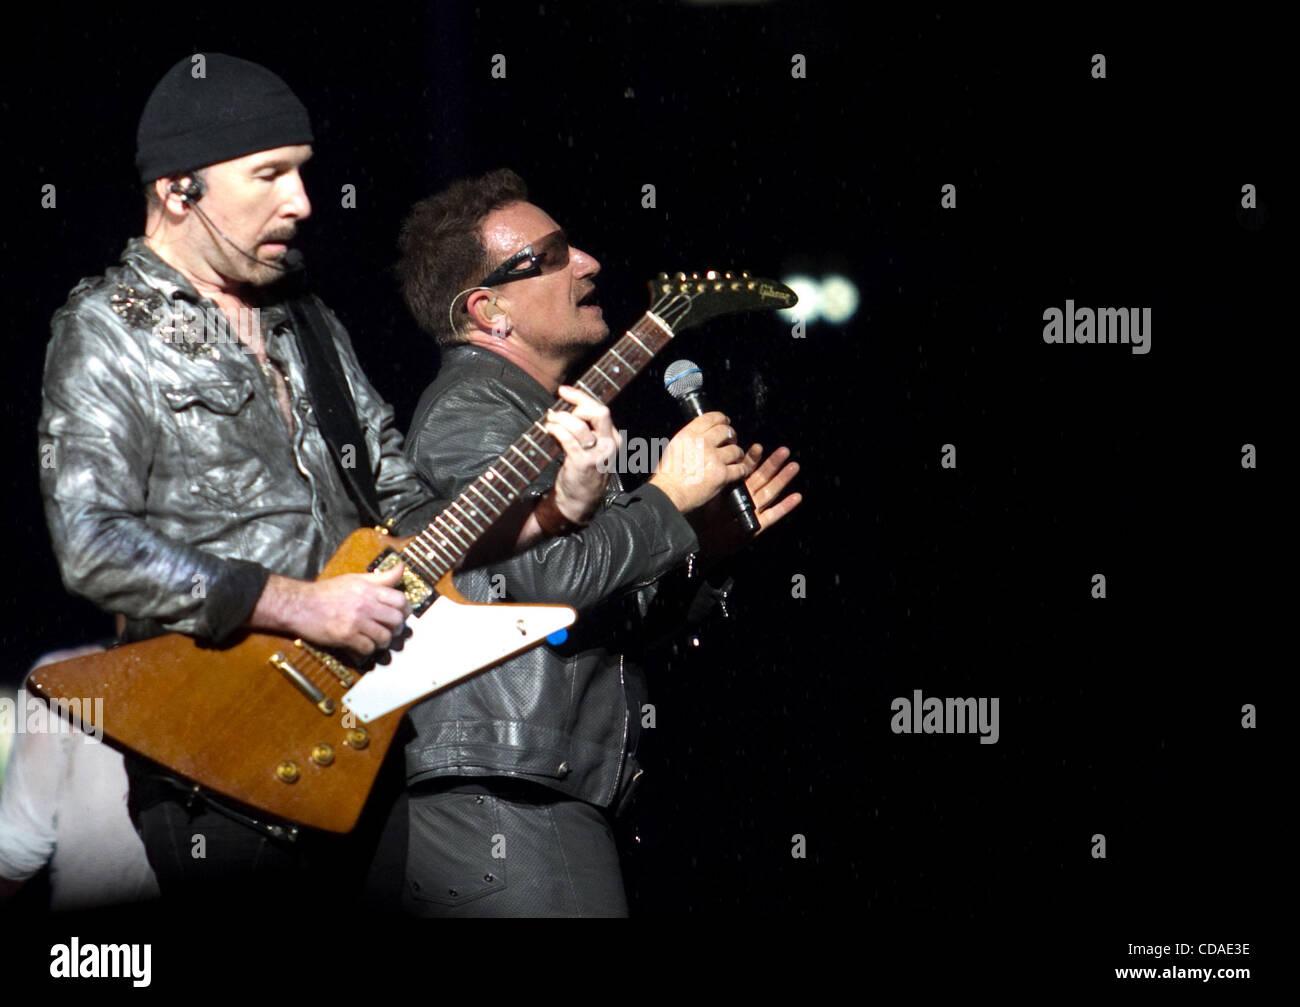 U2 Live at Luzhniki Stadium of Moscow Pictured: l-r U2